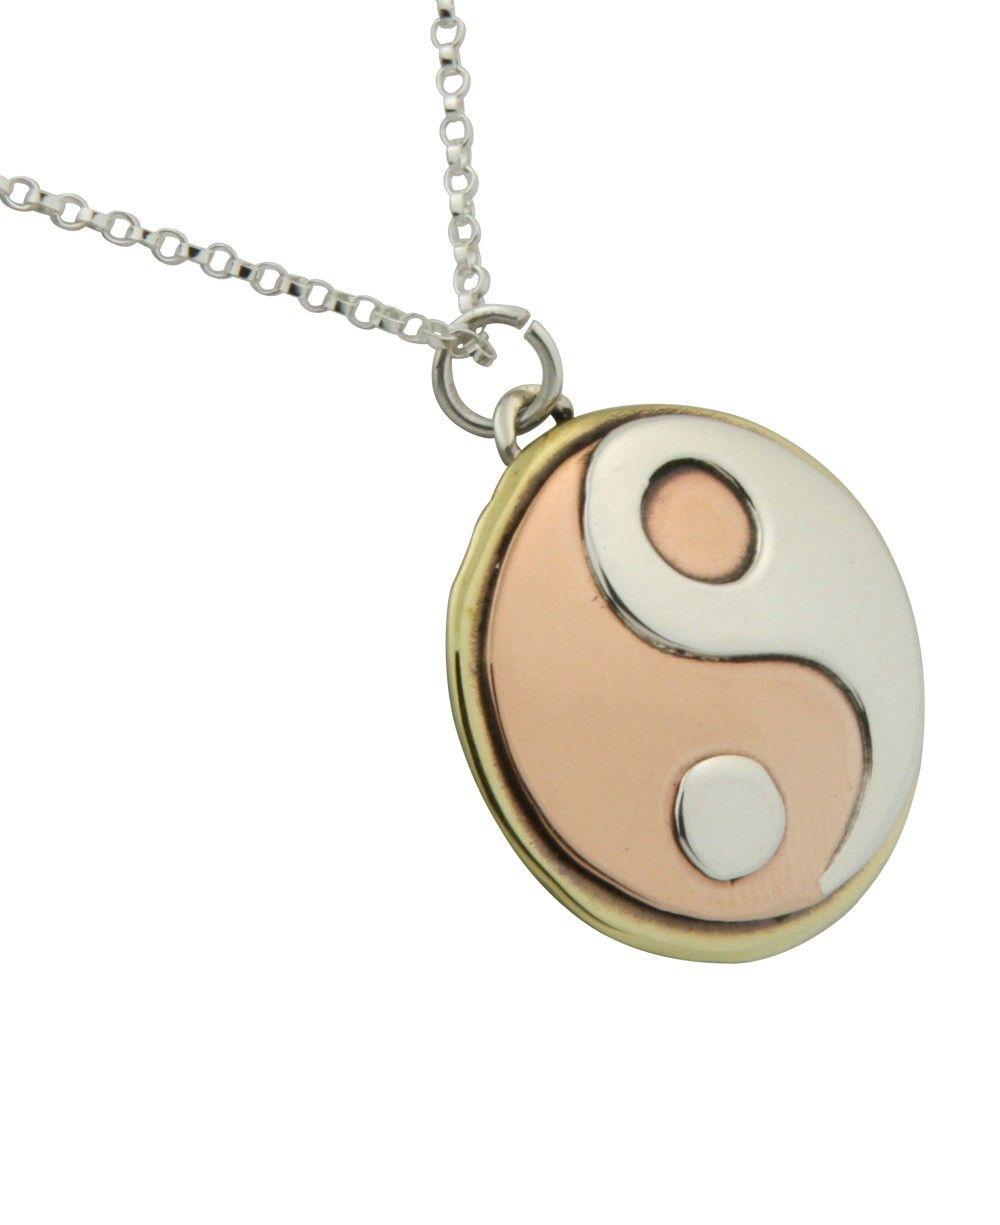 Yin yang necklace buddhist jewelry spiritual jewelry jewelry yin yang necklace buddhist jewelry spiritual jewelry mozeypictures Choice Image